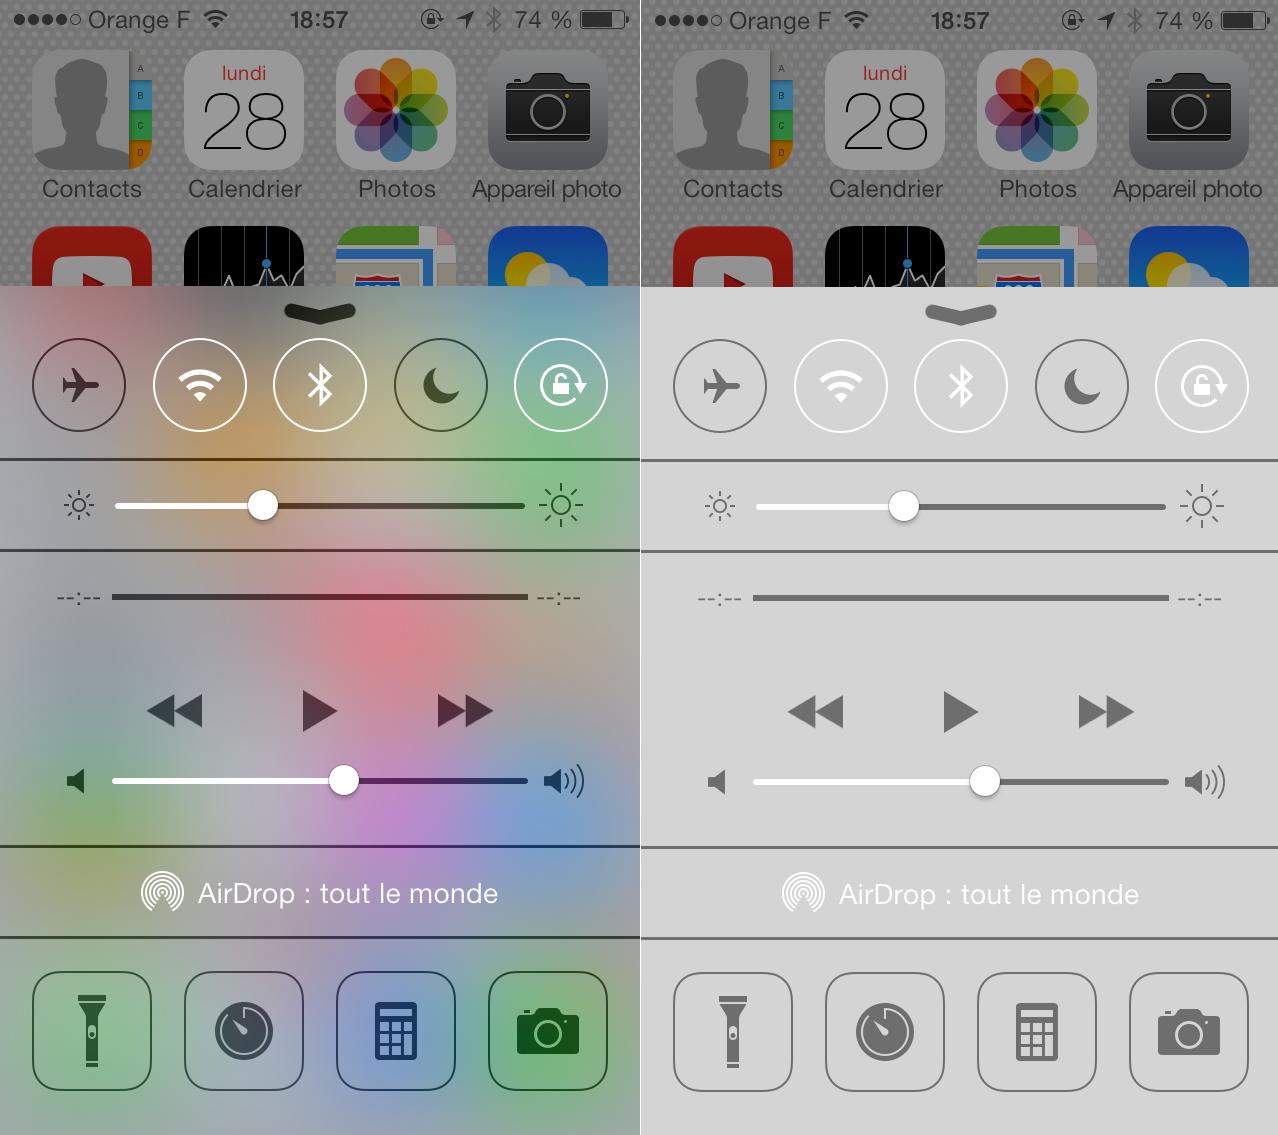 astuce iOS 7 transparence 21 Astuce iOS 7 : Supprimer les effets de transparence